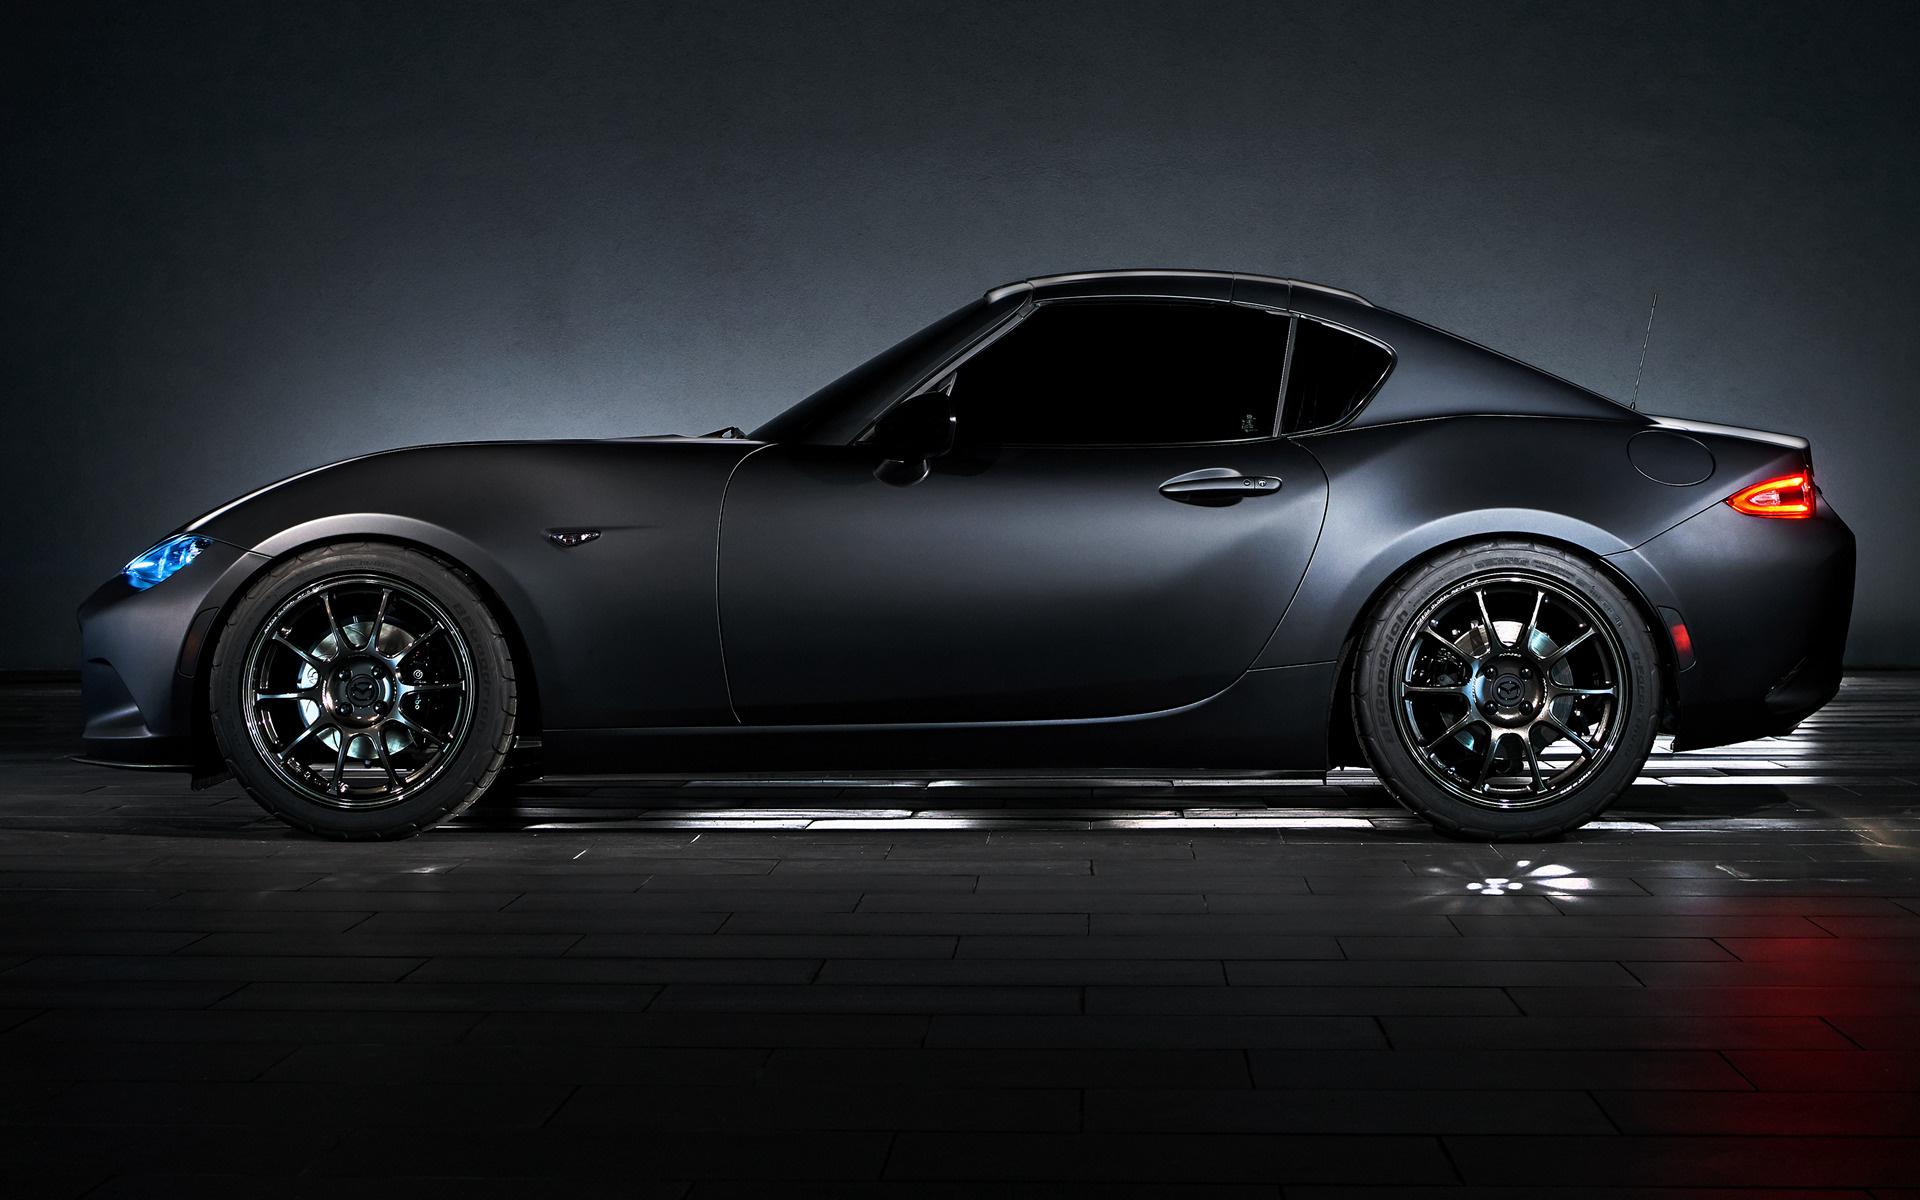 Mazda 6 Sport >> 2016 Mazda MX-5 Miata RF Kuro Concept - Wallpapers and HD ...